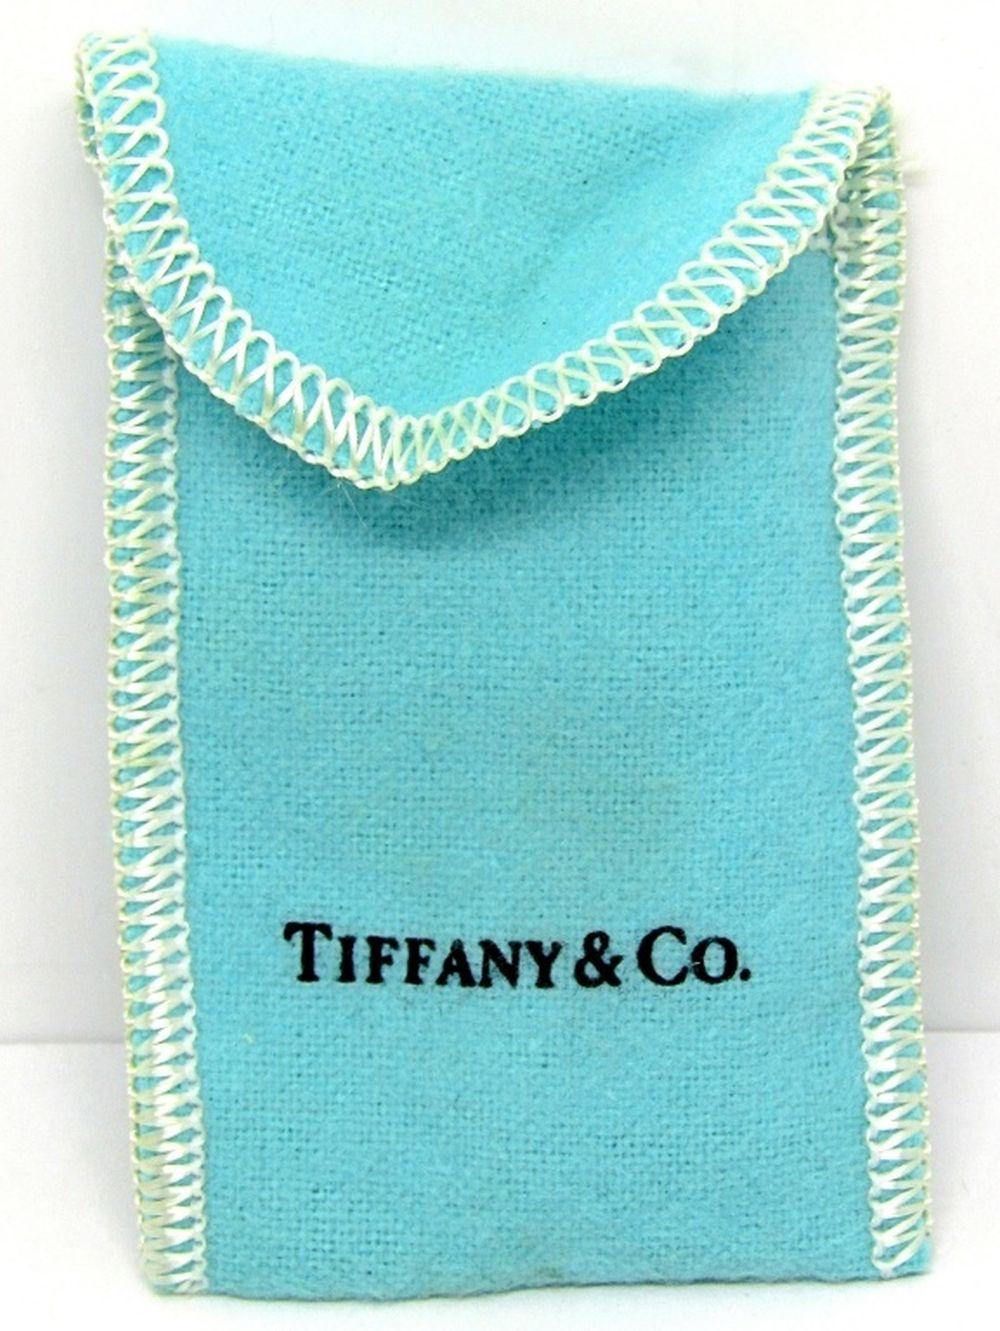 TIFFANY & CO STERLING MEN'S MONEY CLIP